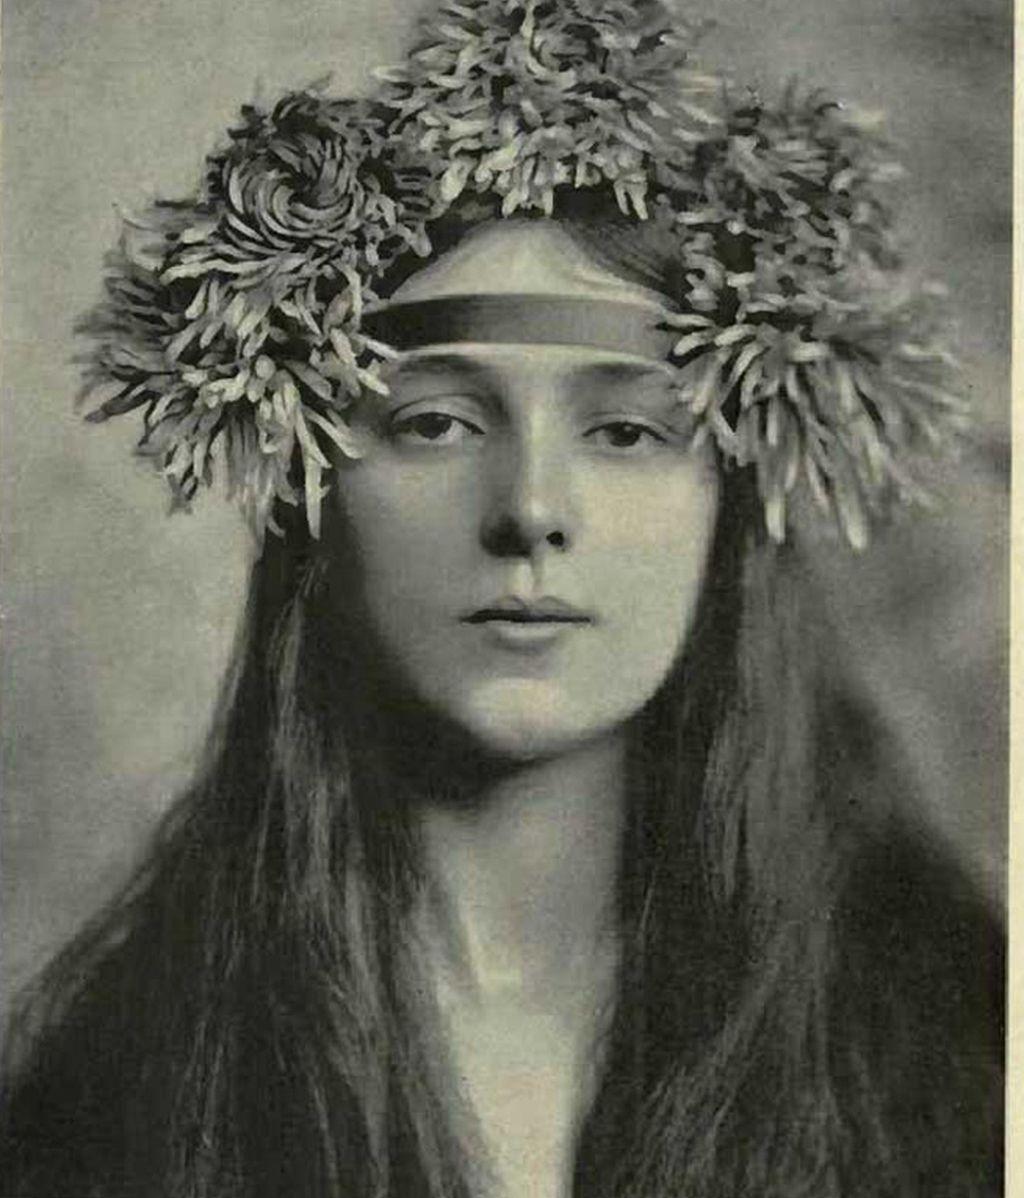 Se llamaba Evelyn Nesbit y nació en 1884